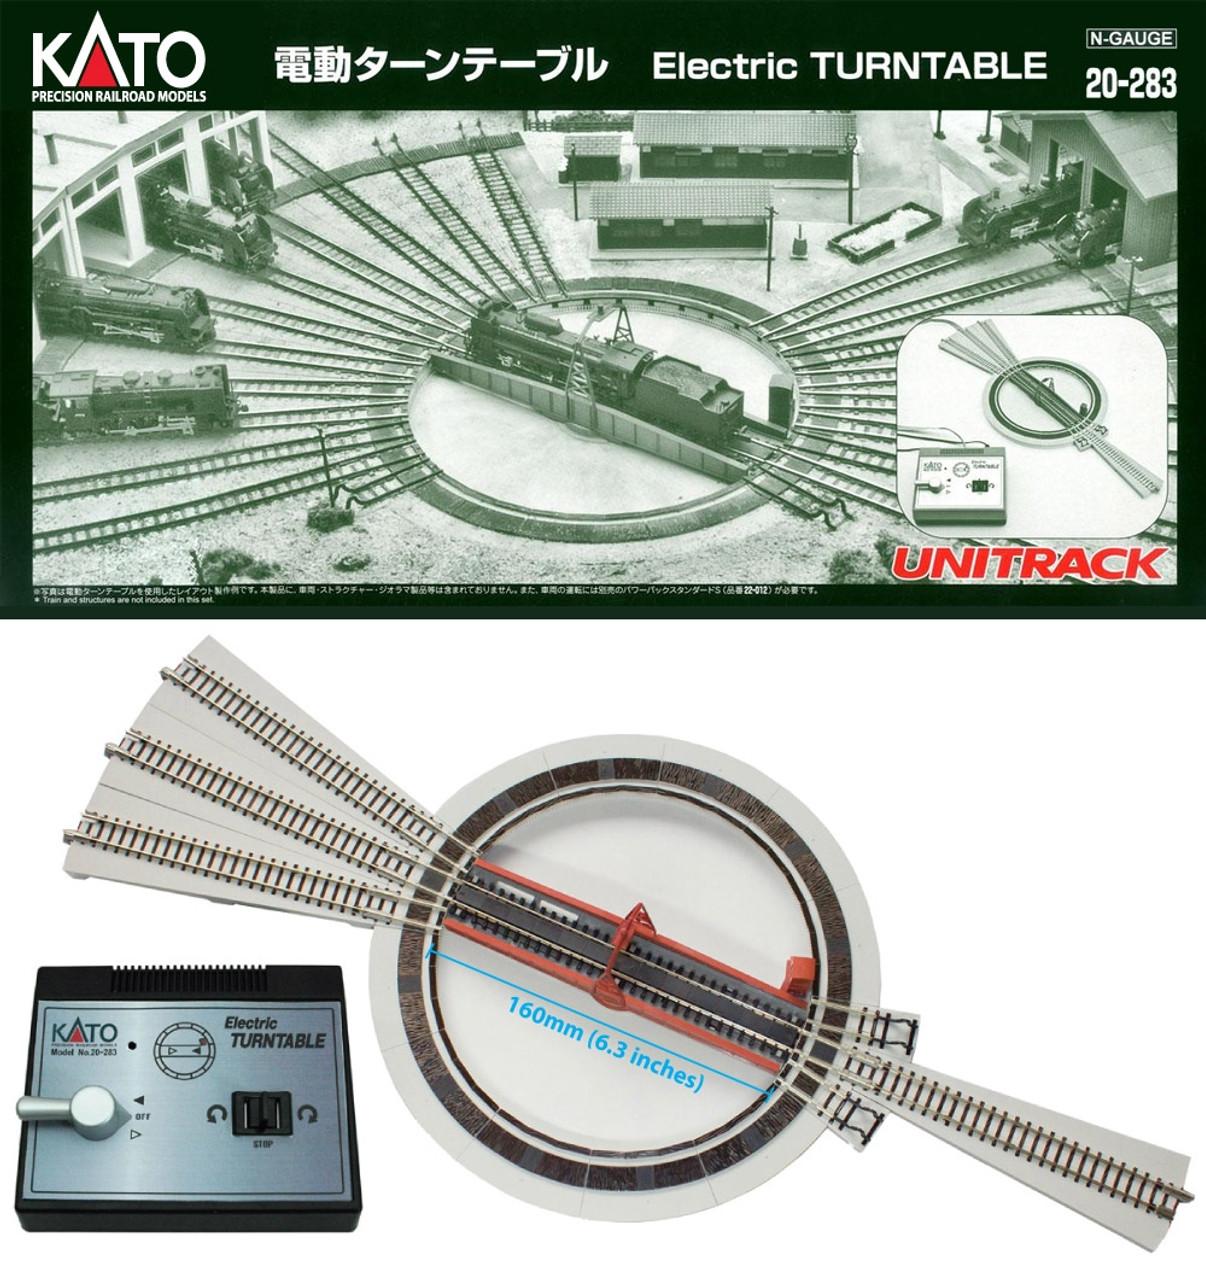 medium resolution of kato n 20 283 motorized turntable dcc friendly modeltrainstuff comkato n 20283 motorized turntable